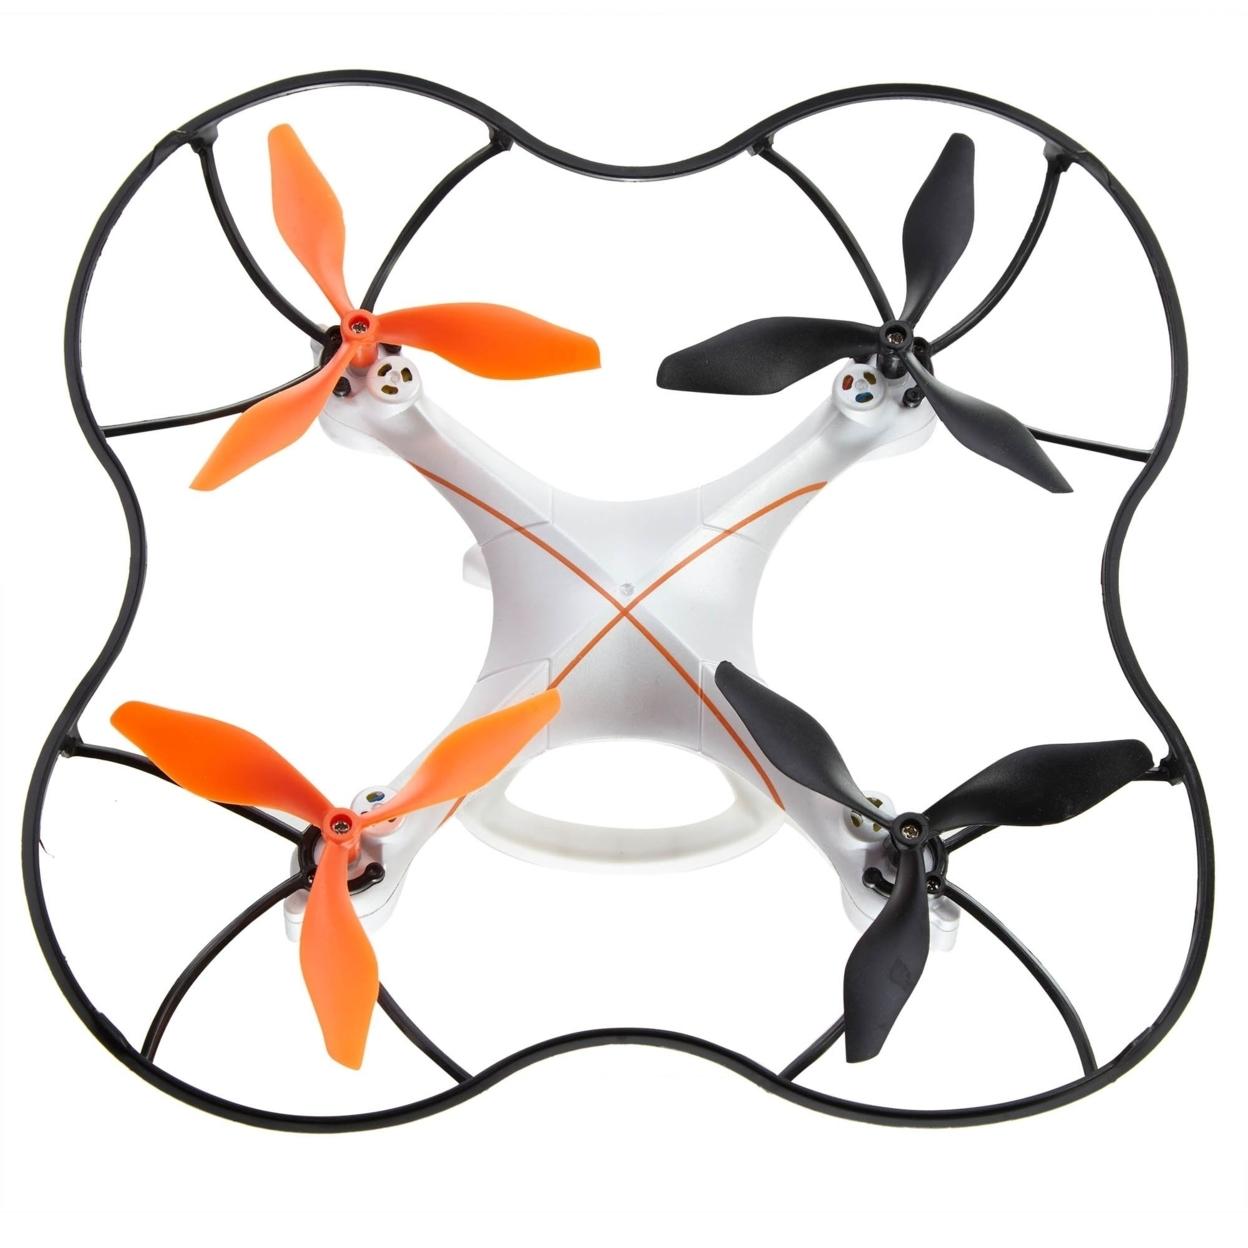 Air America Drone Liberty X 12 5a384b132a00e444153dfc33